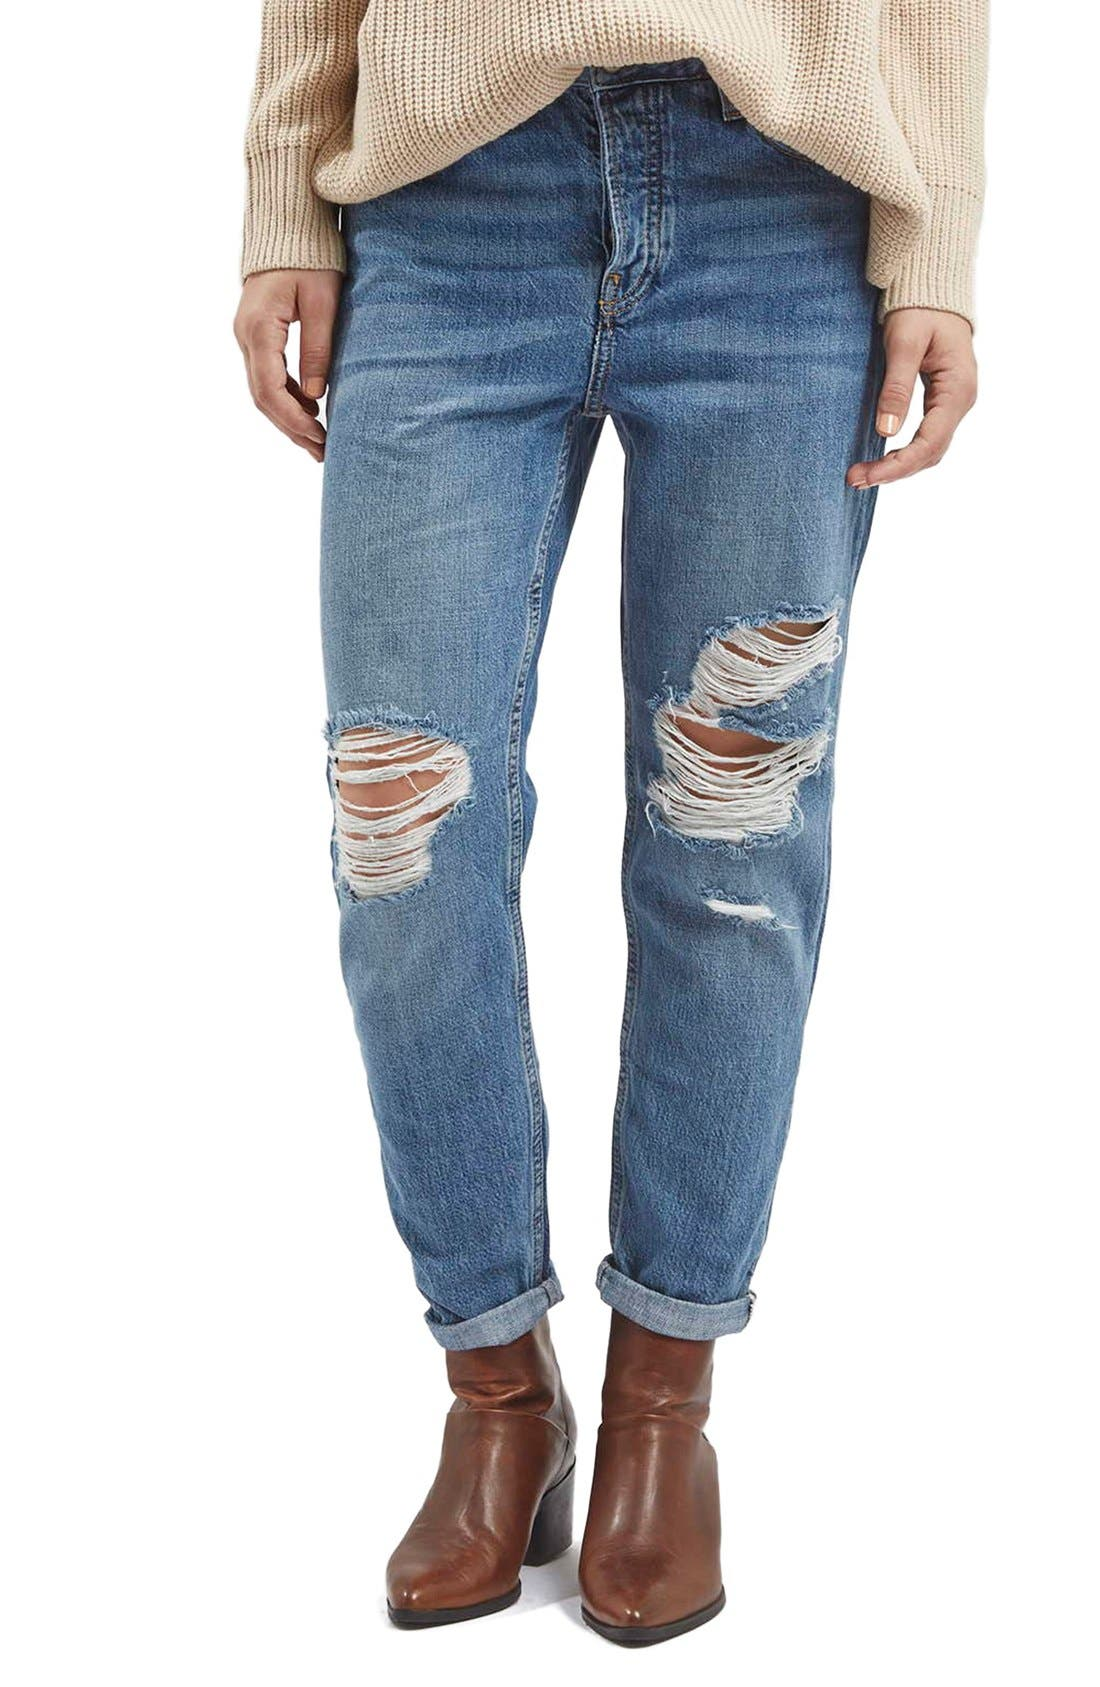 Alternate Image 1 Selected - TopshopMoto'Hayden' Ripped Boyfriend Jeans (Tall)